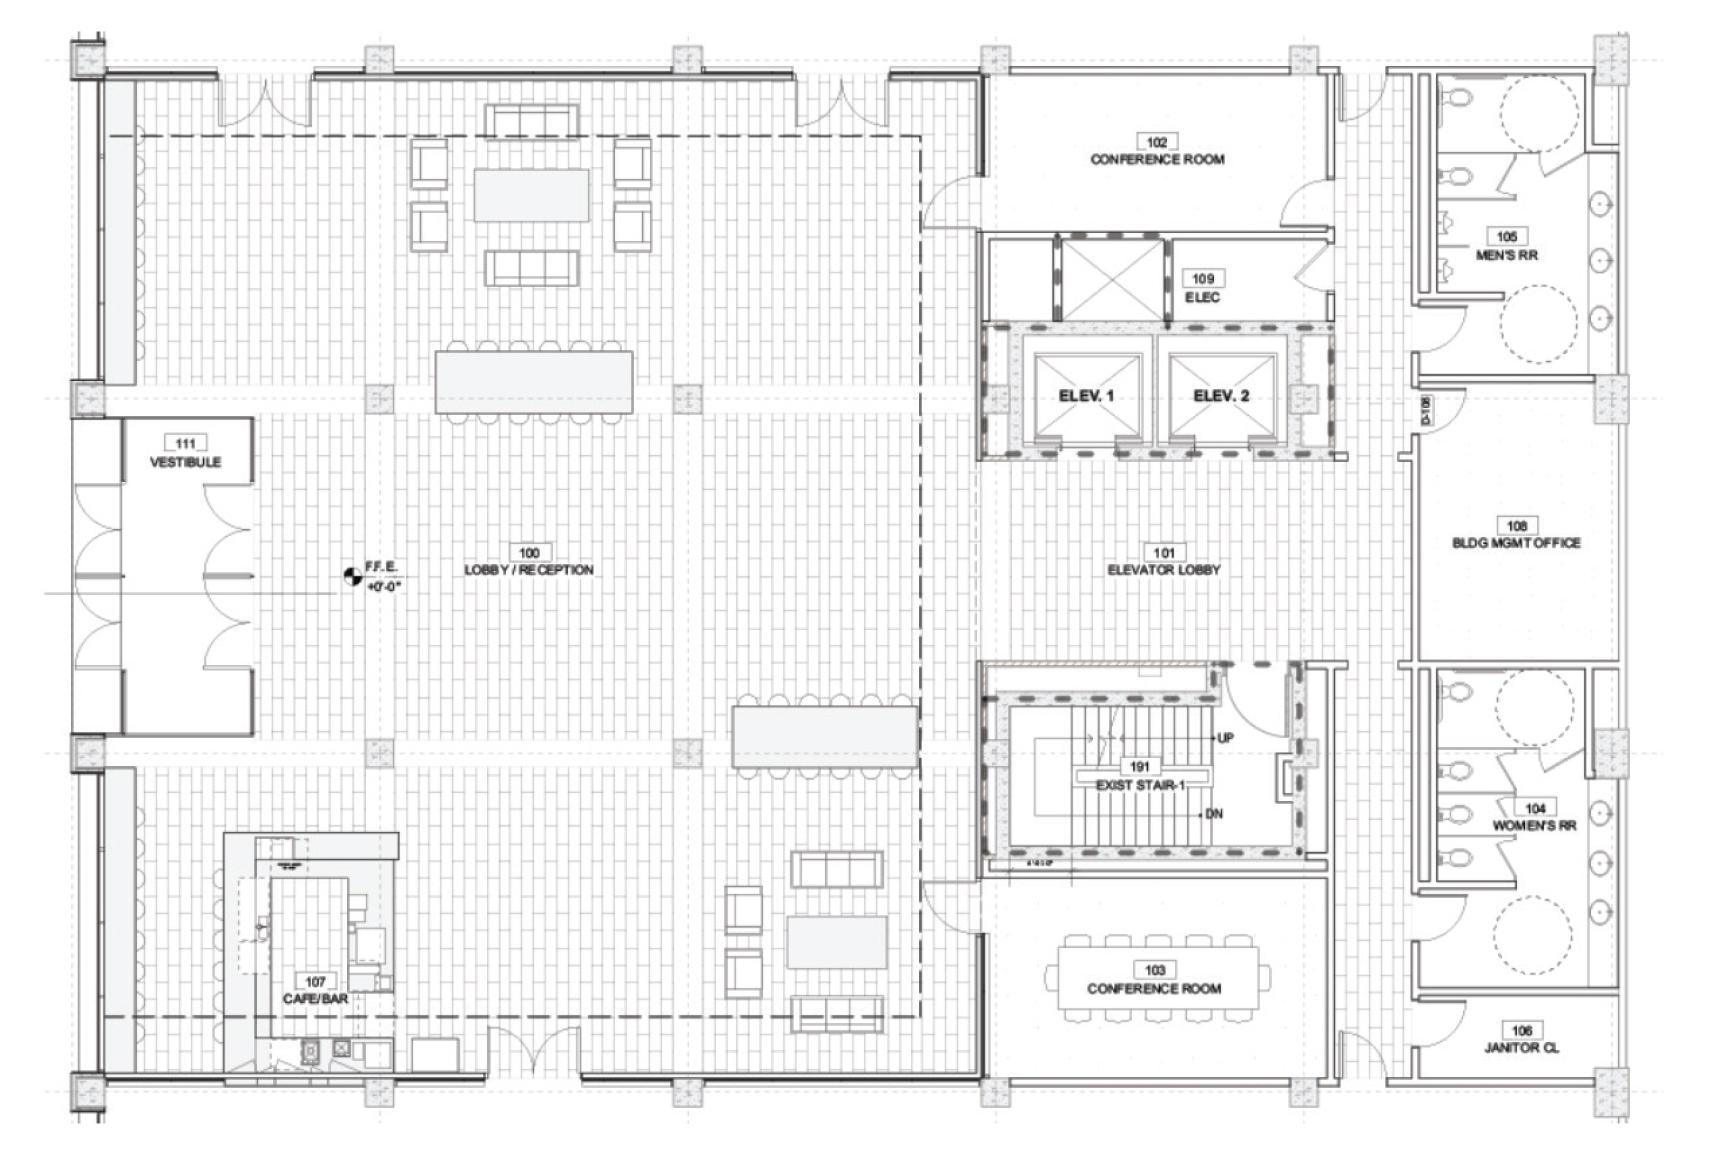 Lobby Plan